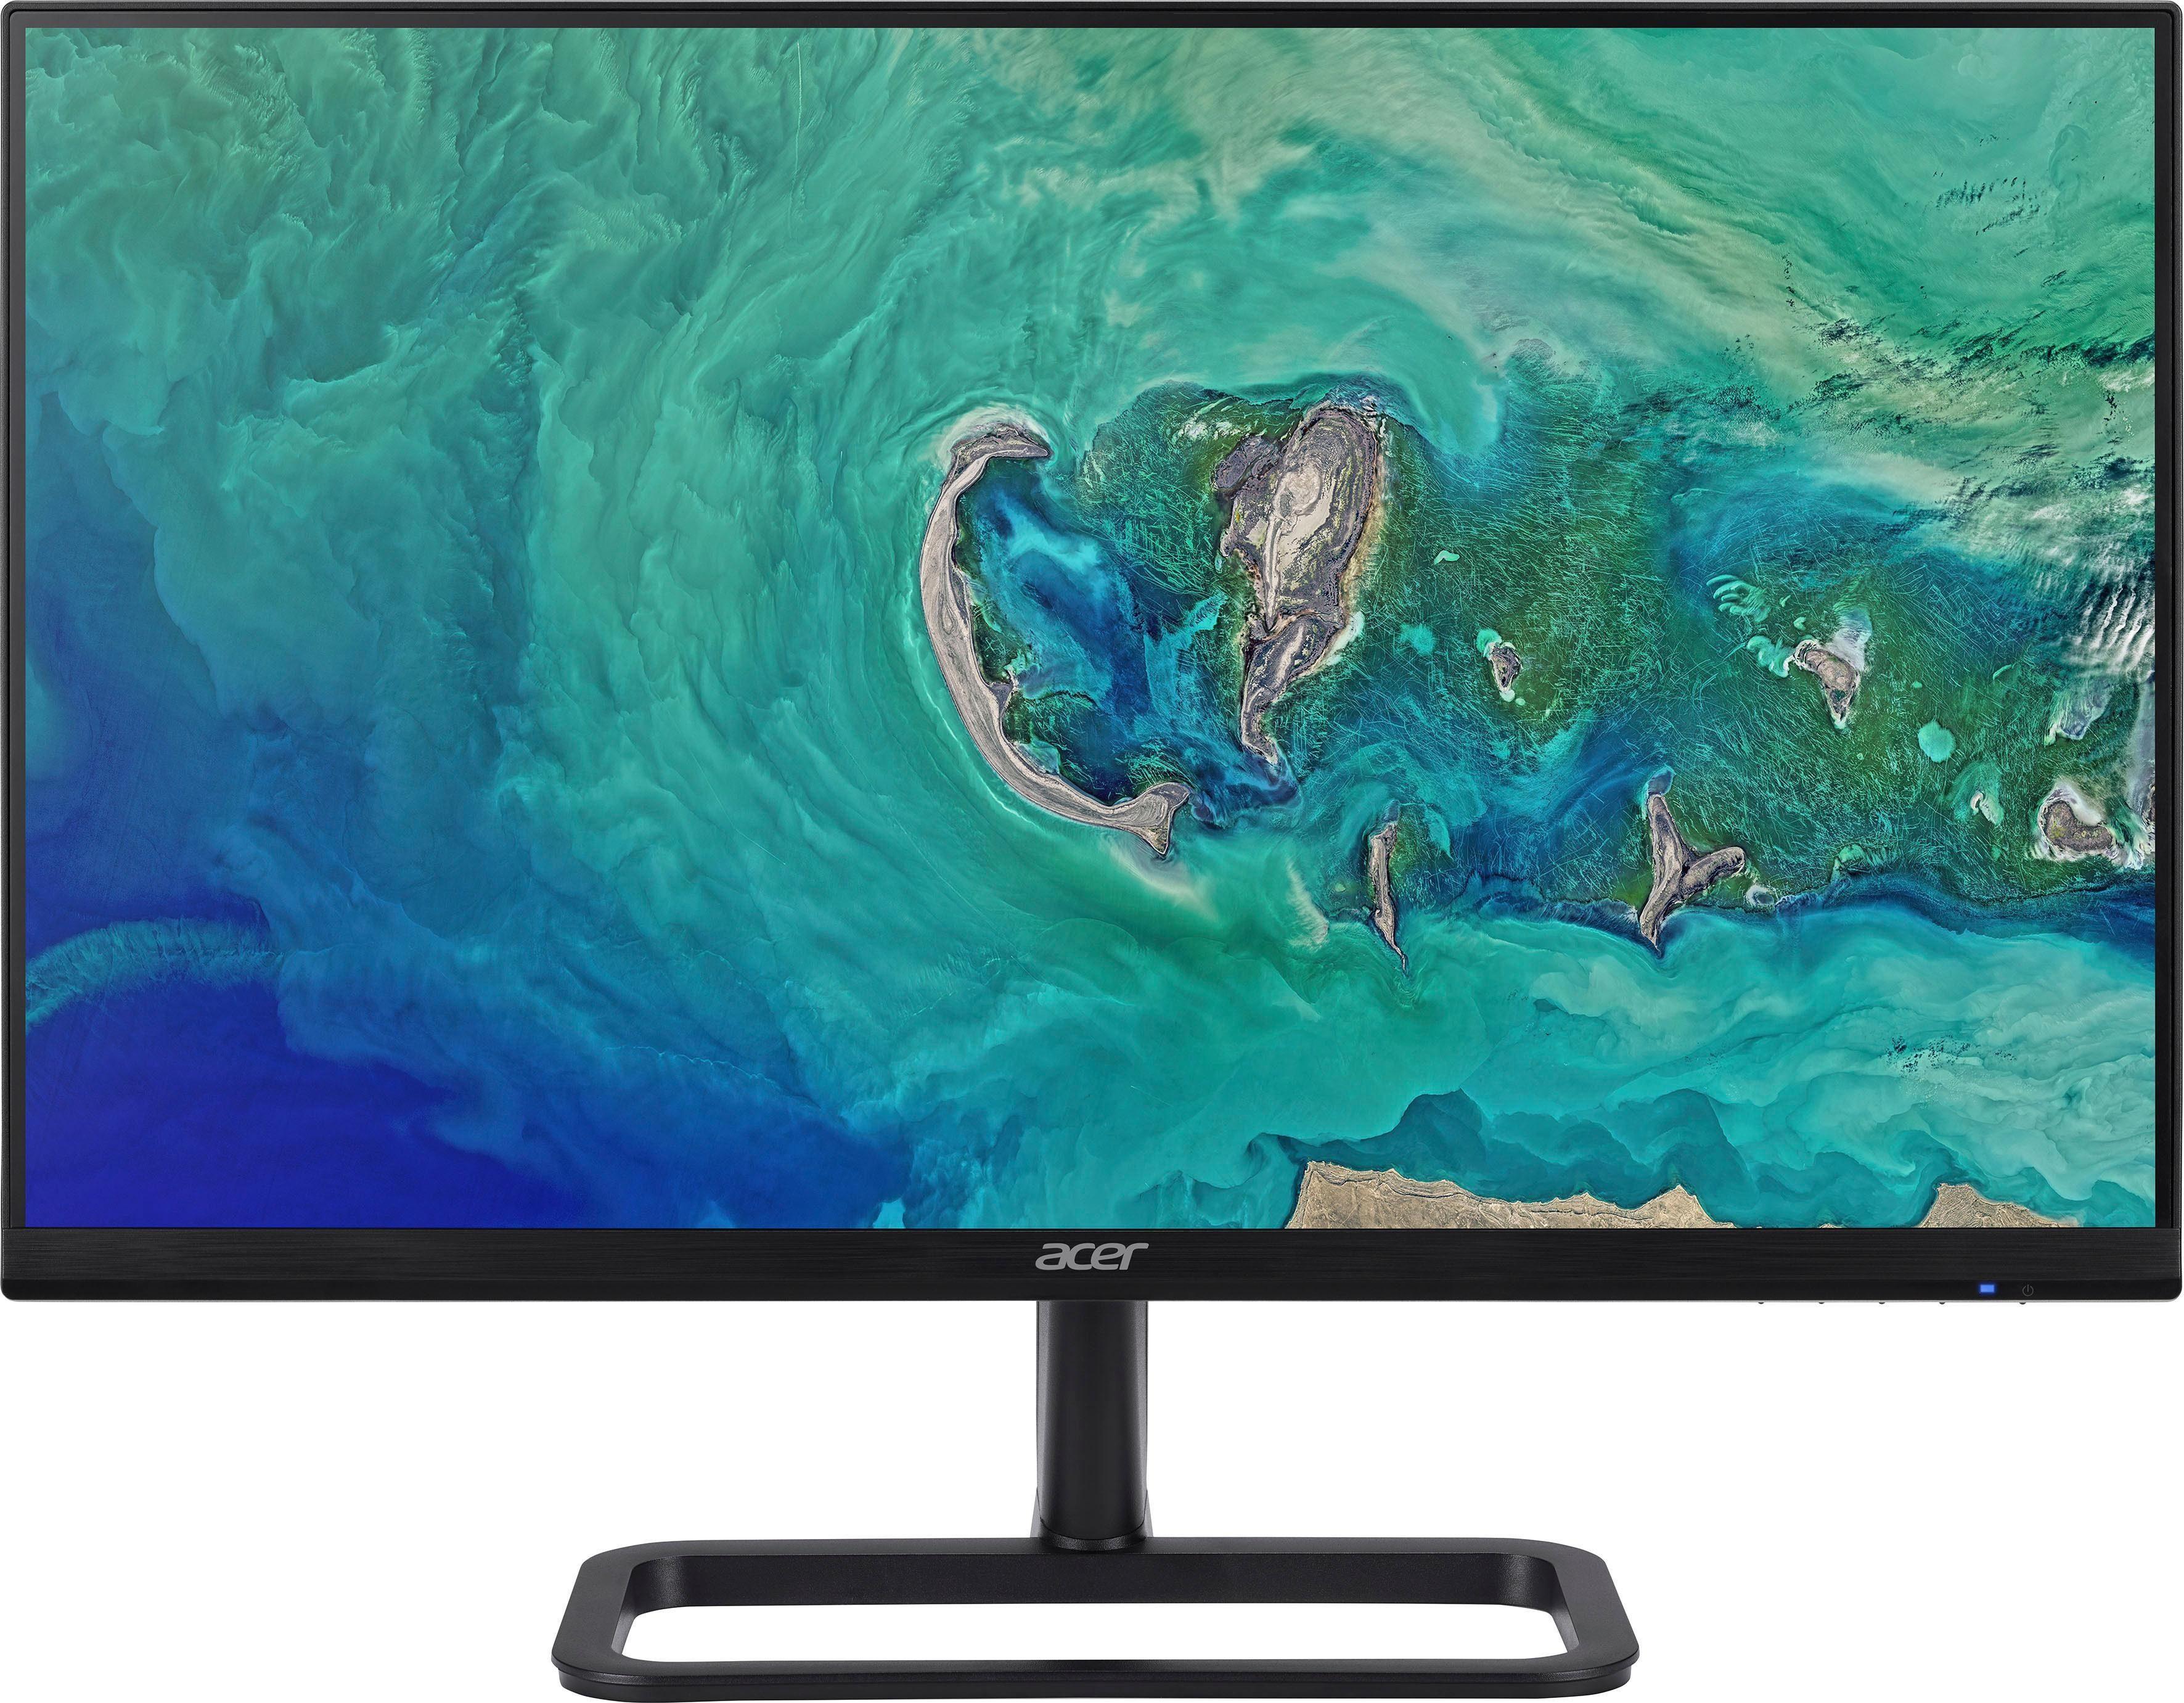 Acer EB243YAbix LED-Monitor (1920 x 1080 Pixel, Full HD, 5 ms Reaktionszeit, 60 Hz)